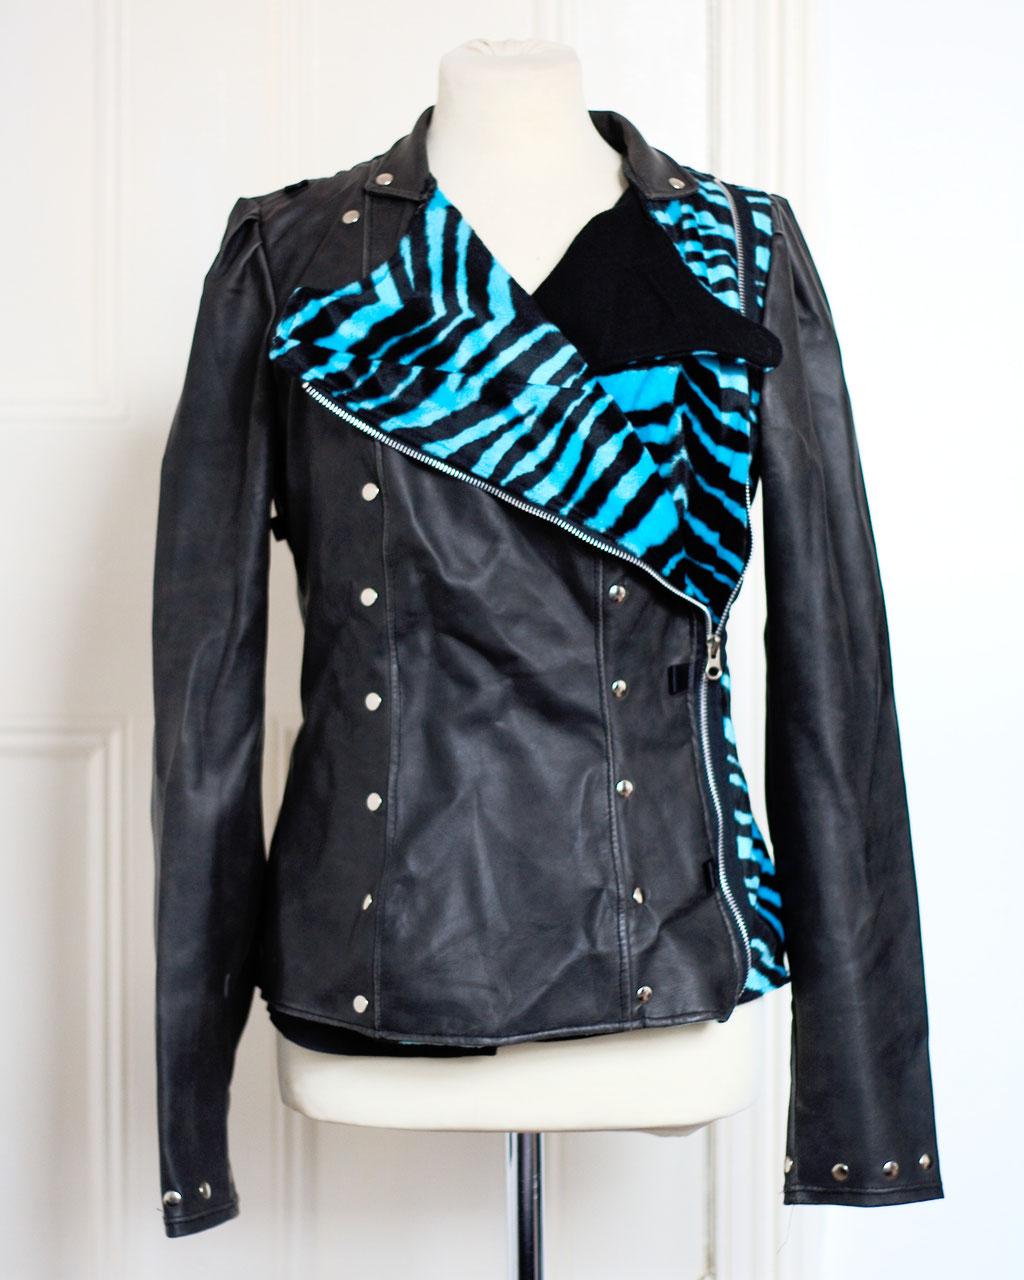 Flohmarkt: Pullis und Jacken - Shitsville Kunstlederjacke Zebra türkis - Zebraspider DIY Anti-Fashion Blog